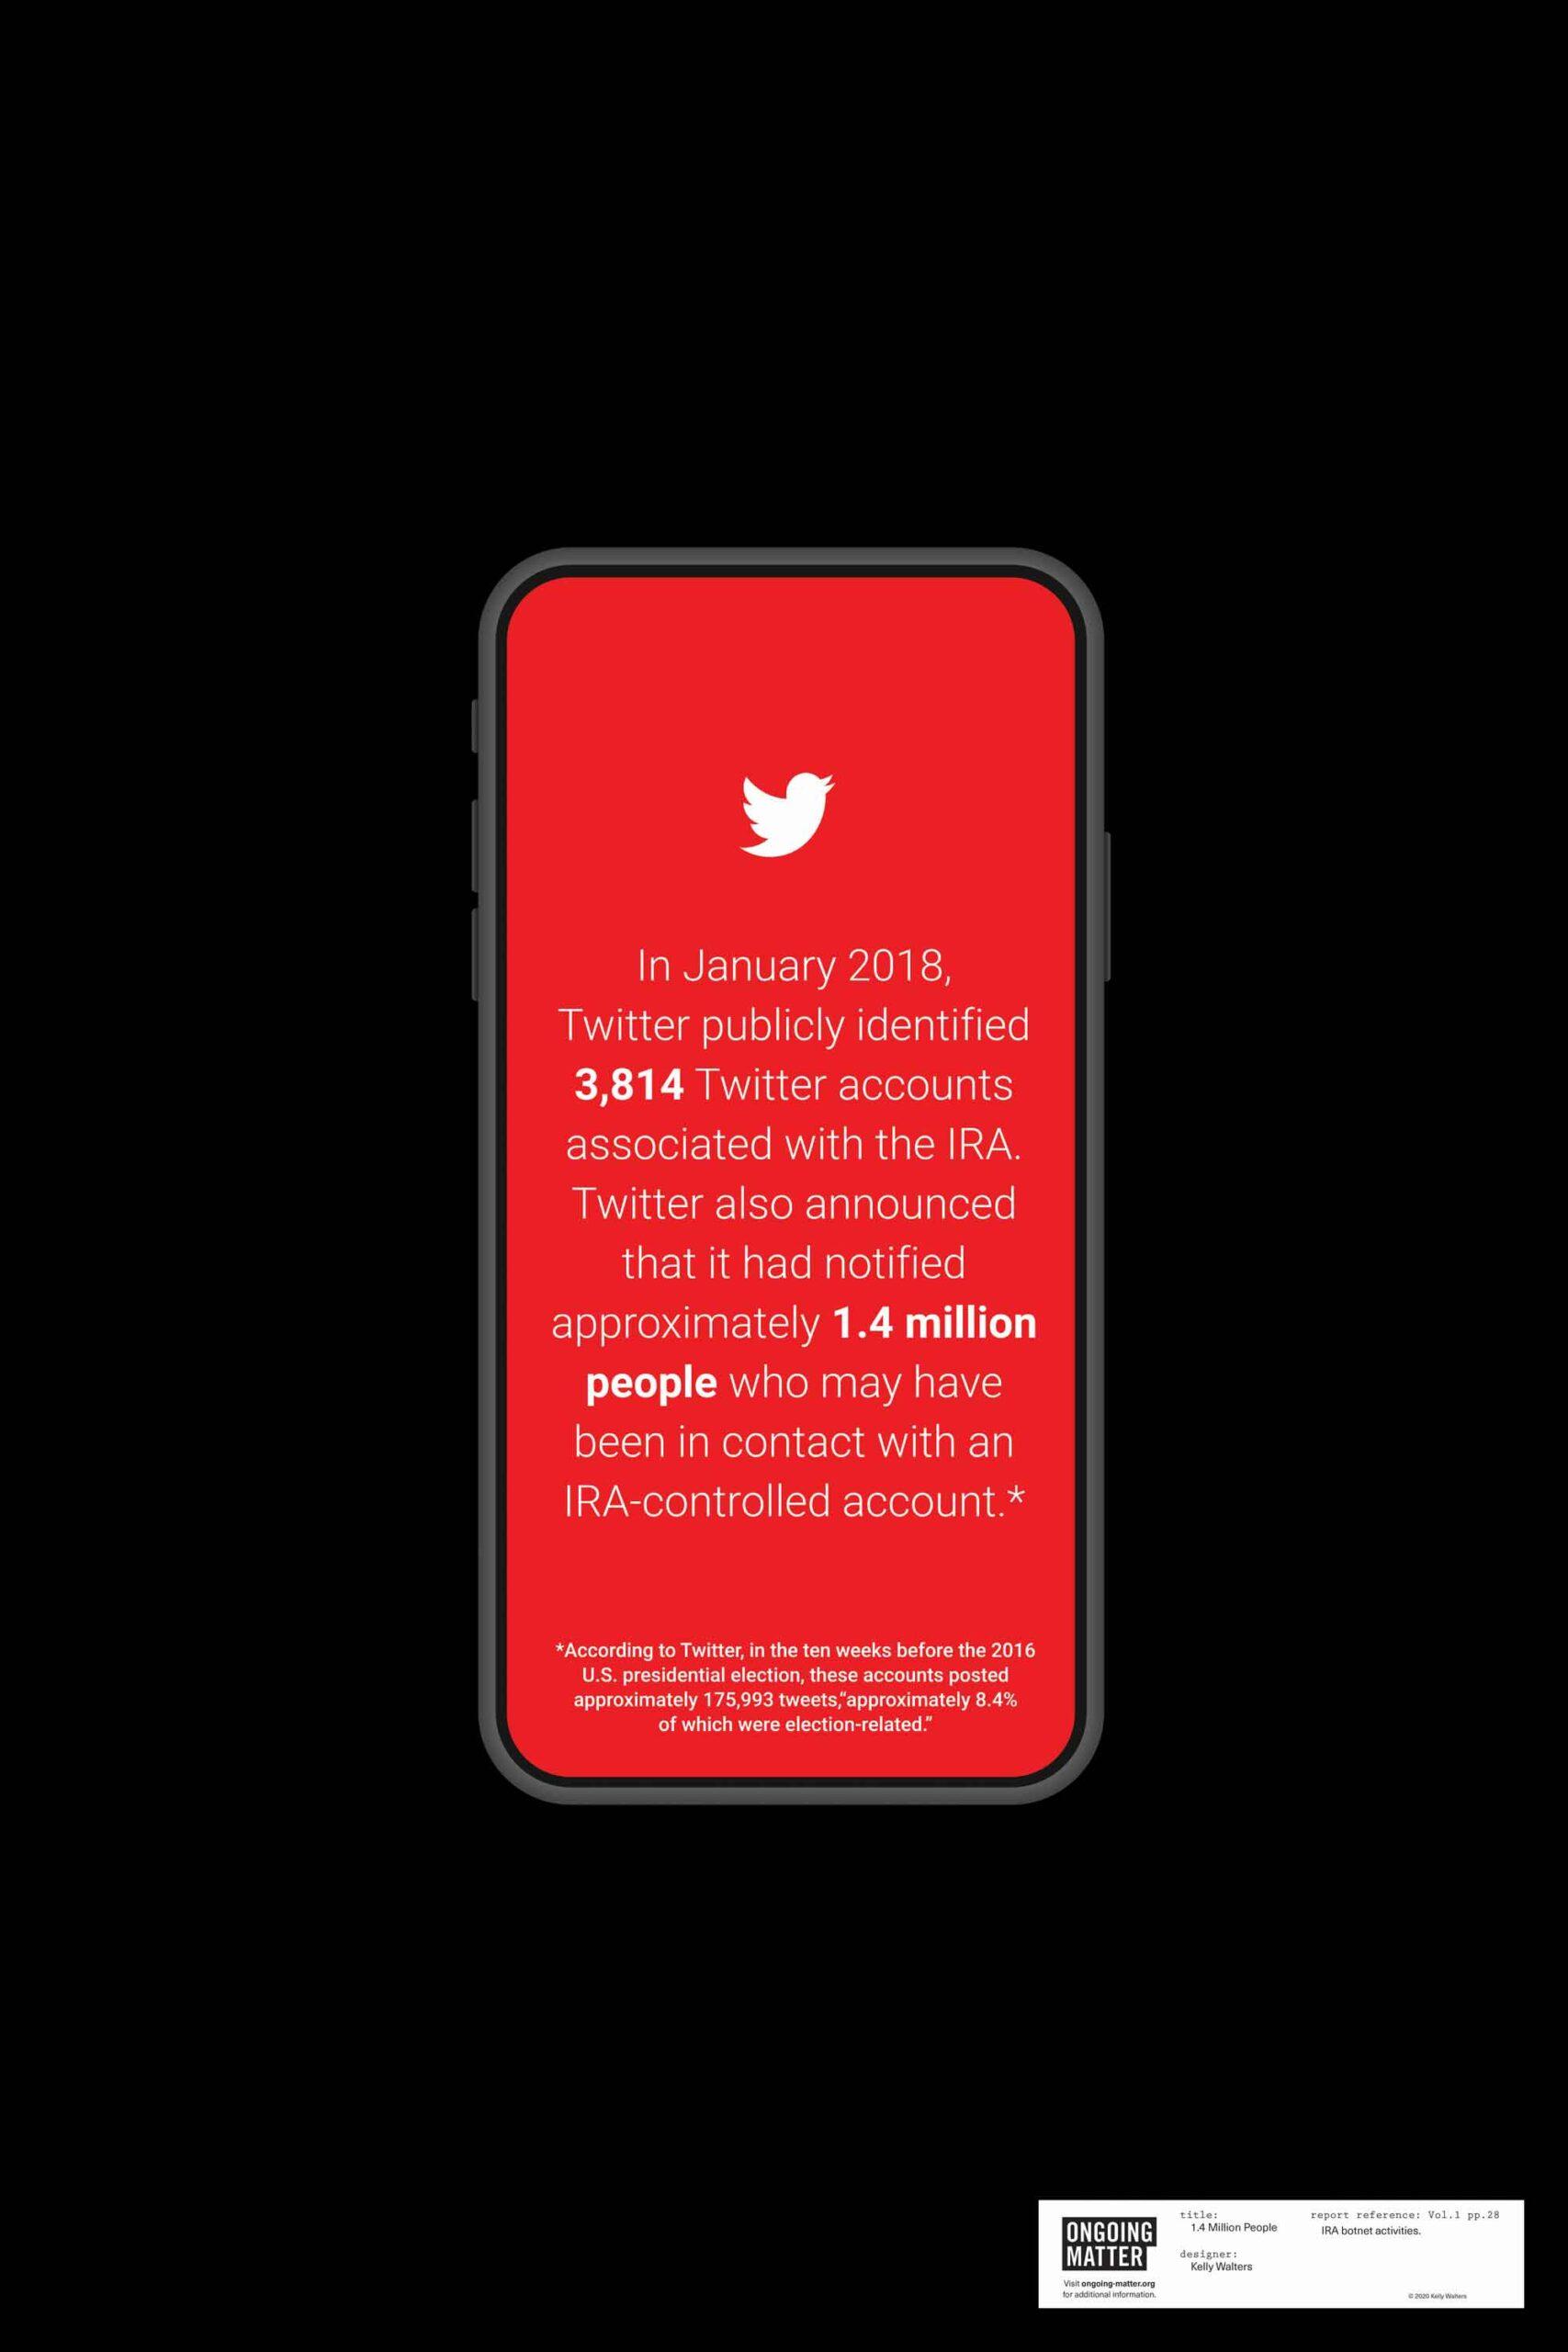 1.4 Million People by Kelly Walters